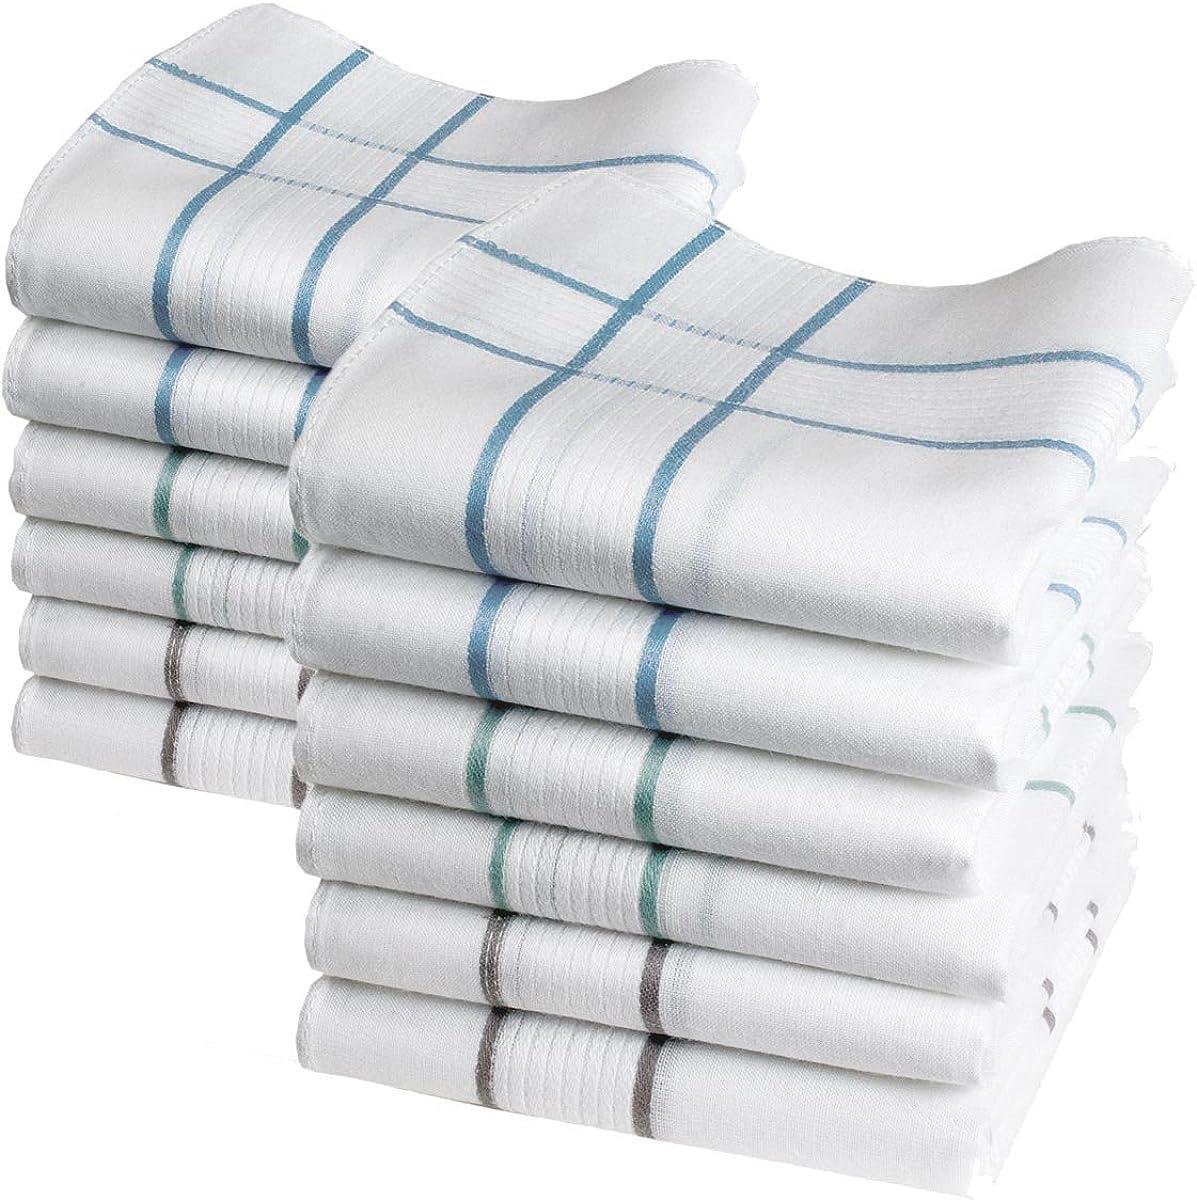 Merrysquare – Pañuelos para hombre discretos – Modelo Elliott – Tamaño grande 40 cm x 40 cm – 6 o 12 piezas – 100% algodón – Surtido 3 colores